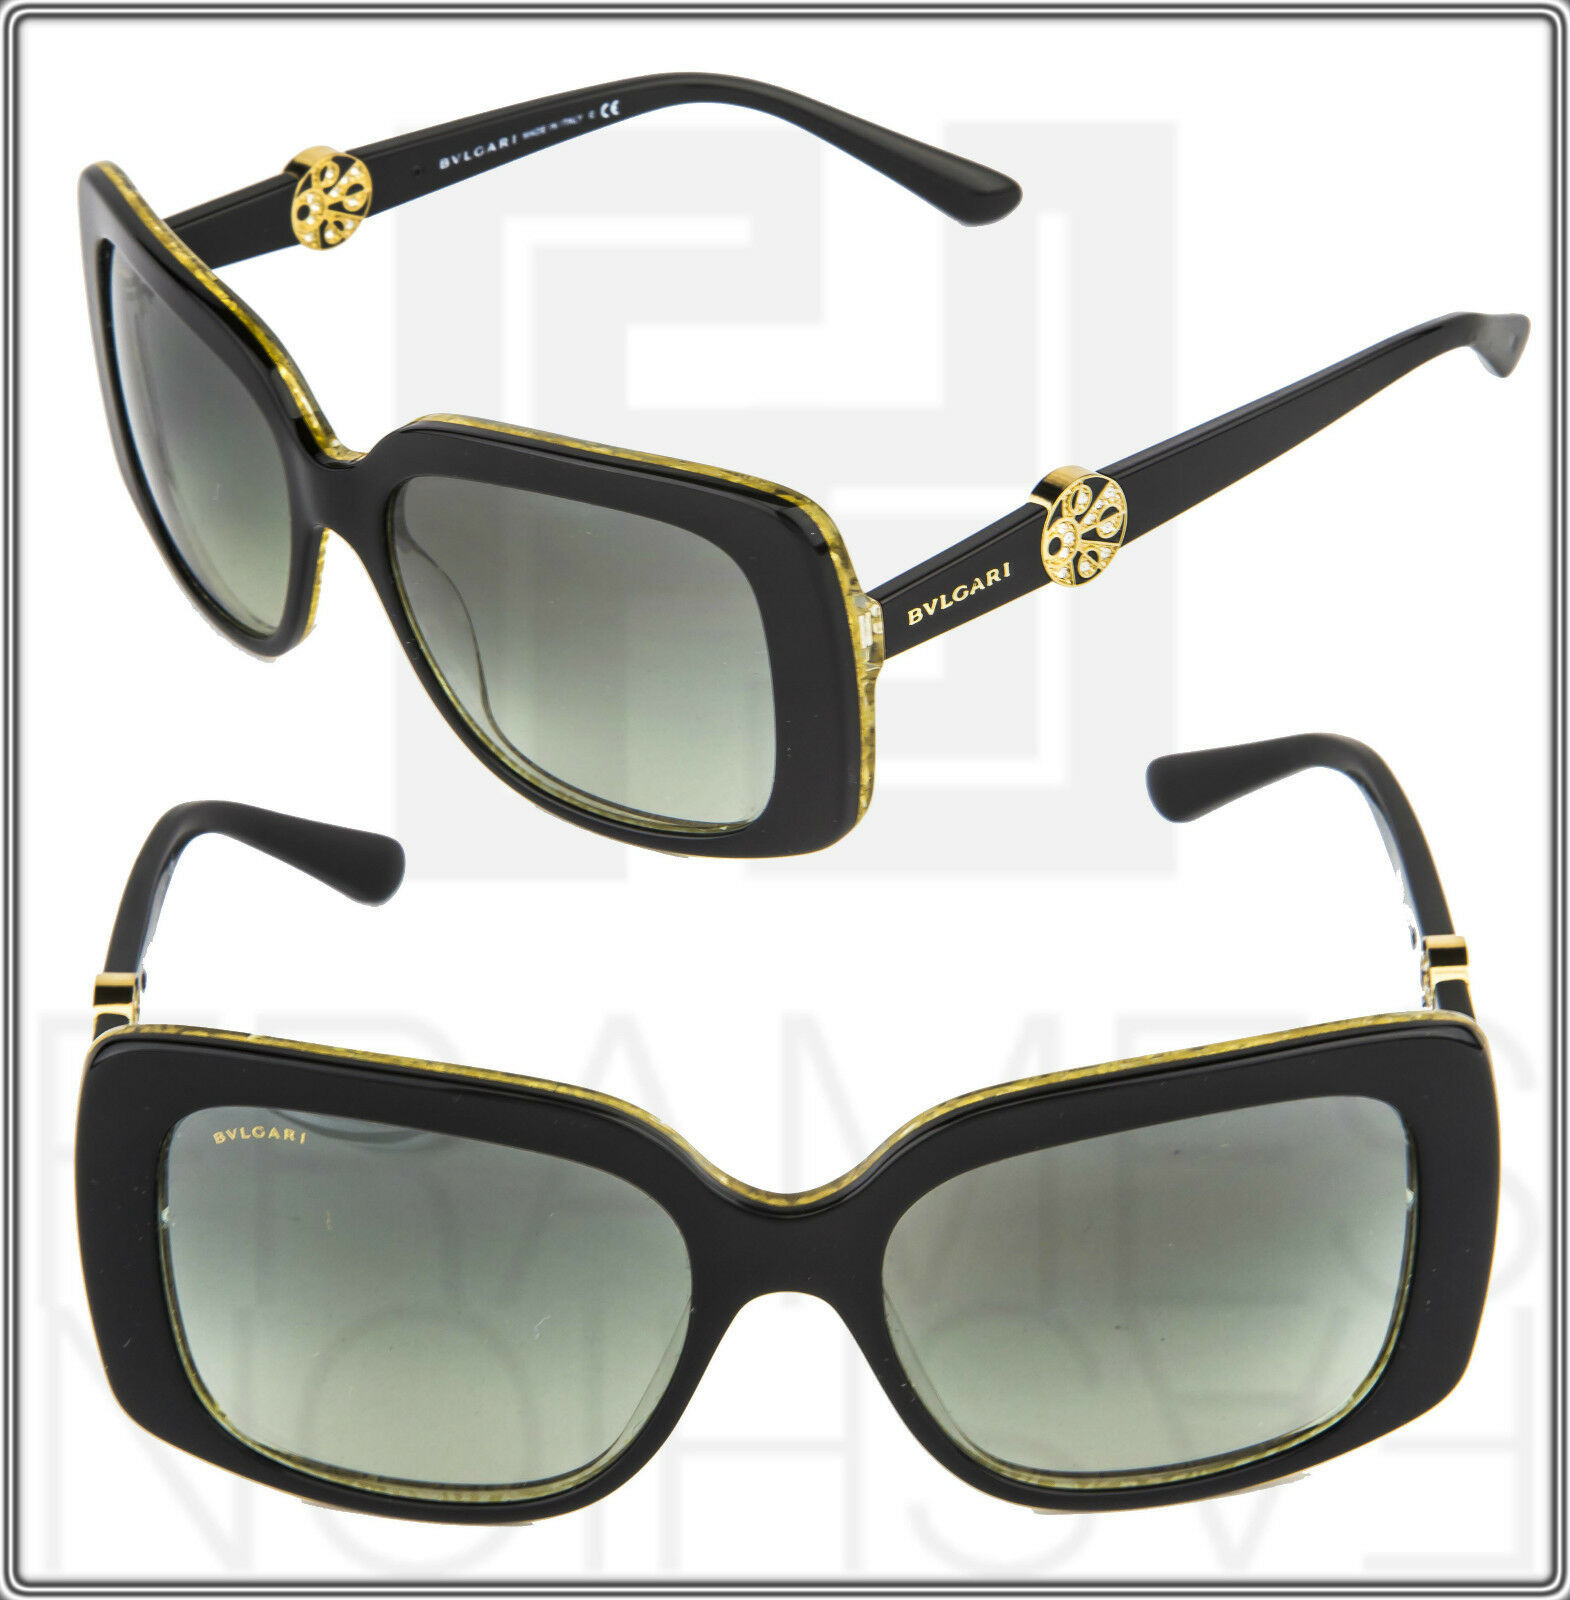 BVLGARI INTARSIO 8146B 5325/11 Black Gold Sunglasses 8146 Square Women Gradient